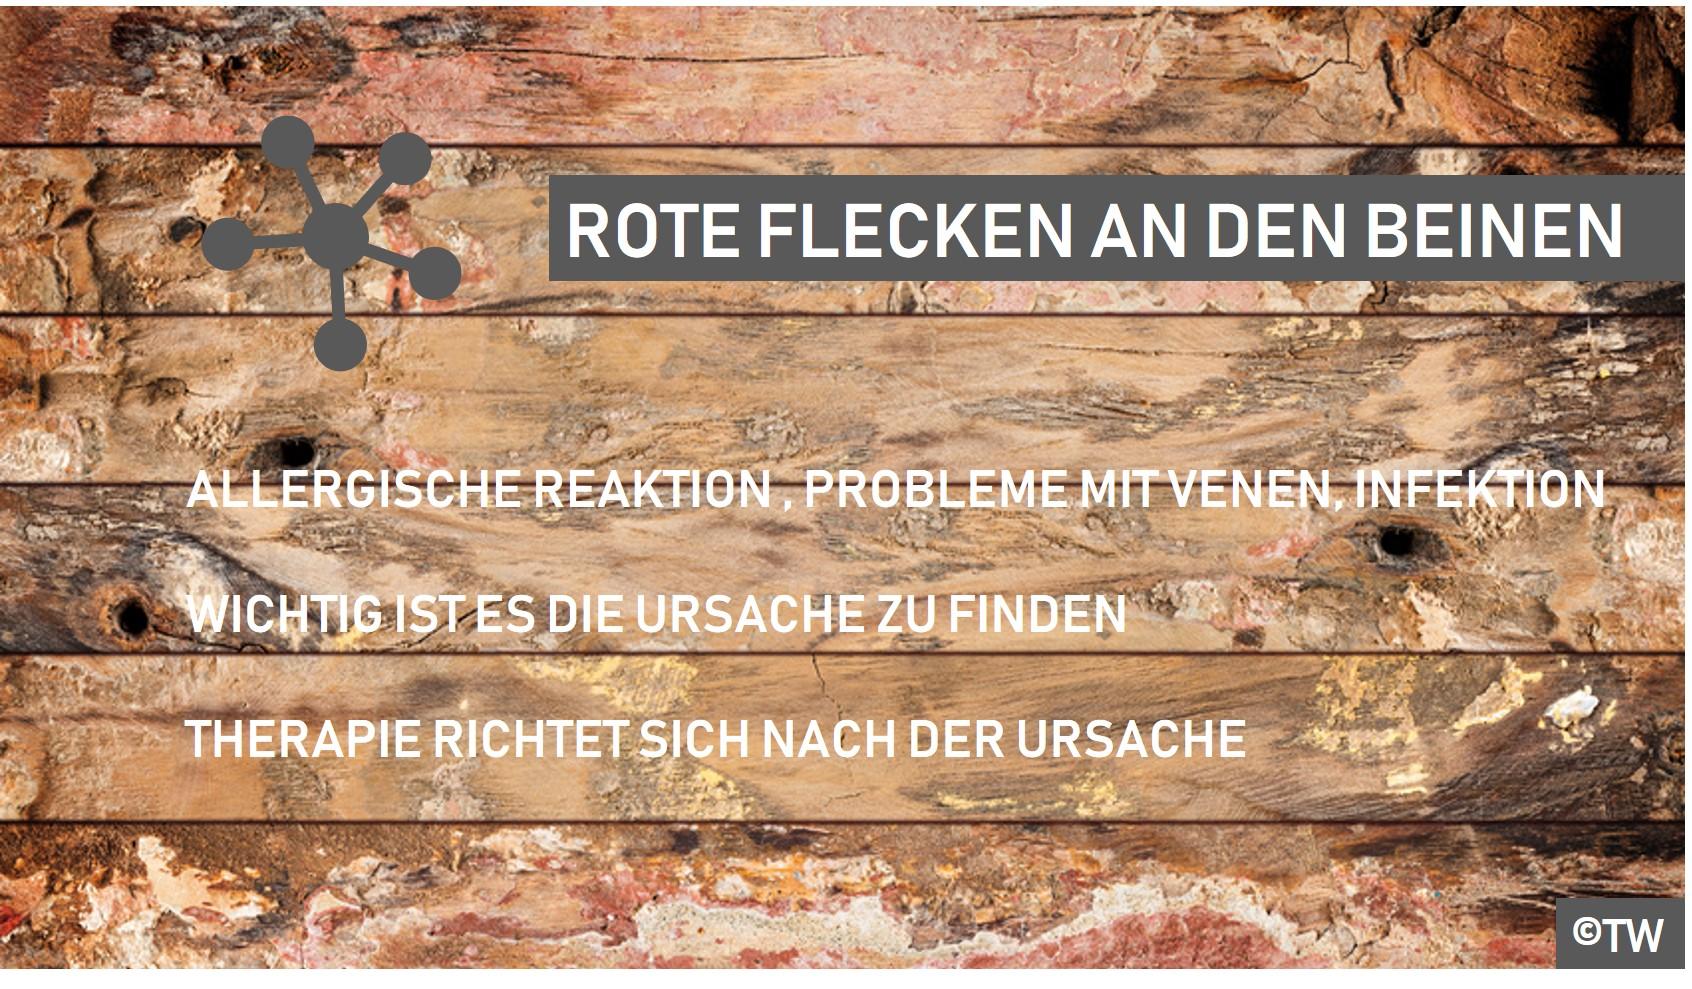 www.doktorweigl.de